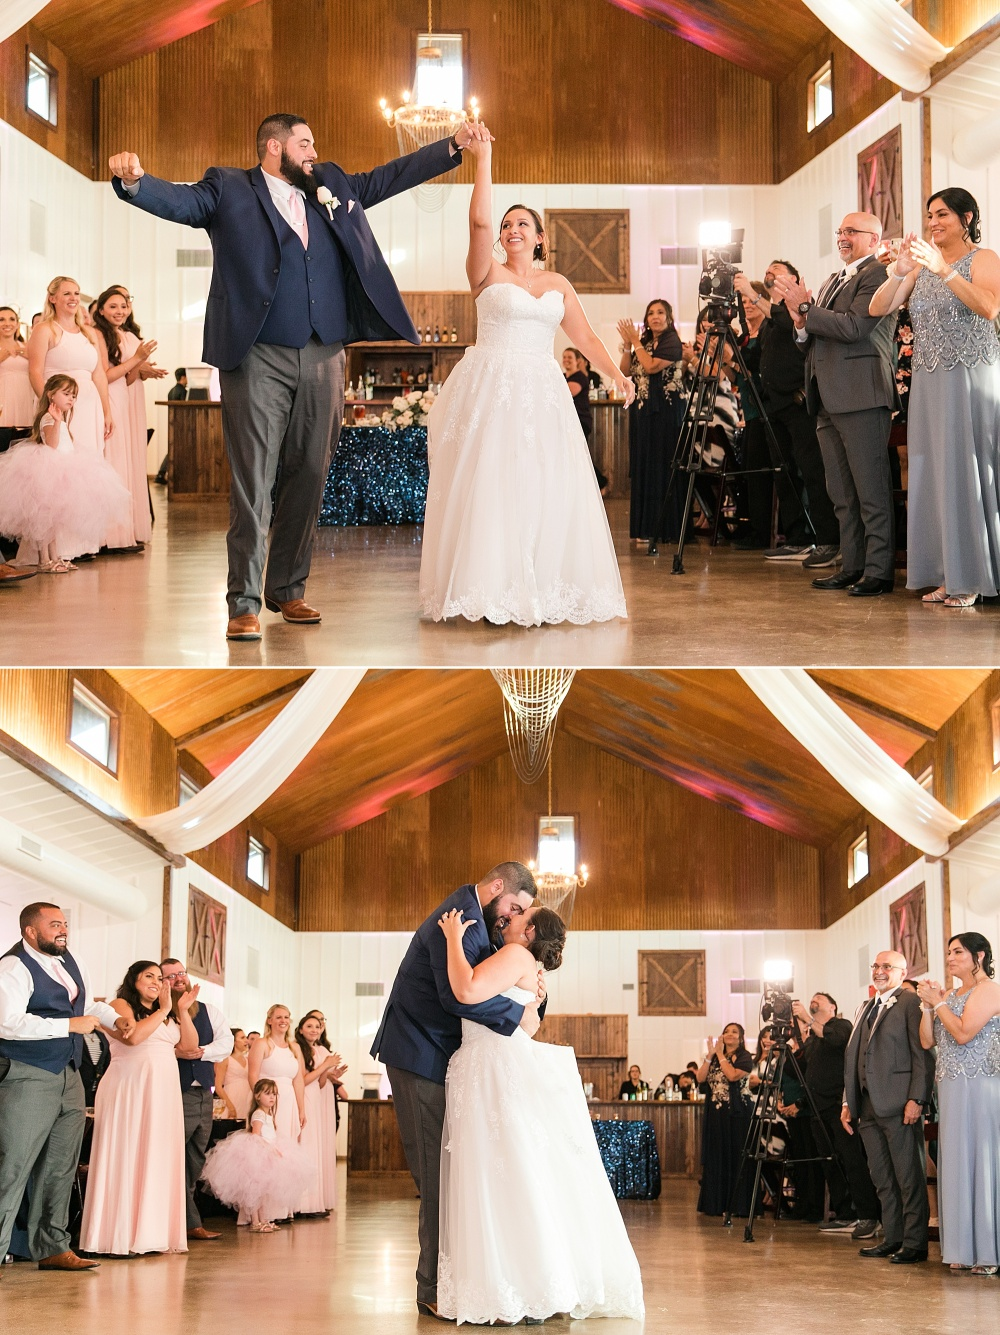 Wedding-Photographer-Bulverde-Texas-Western-Sky-Event-Venue-Carly-Barton-Photography_0058.jpg